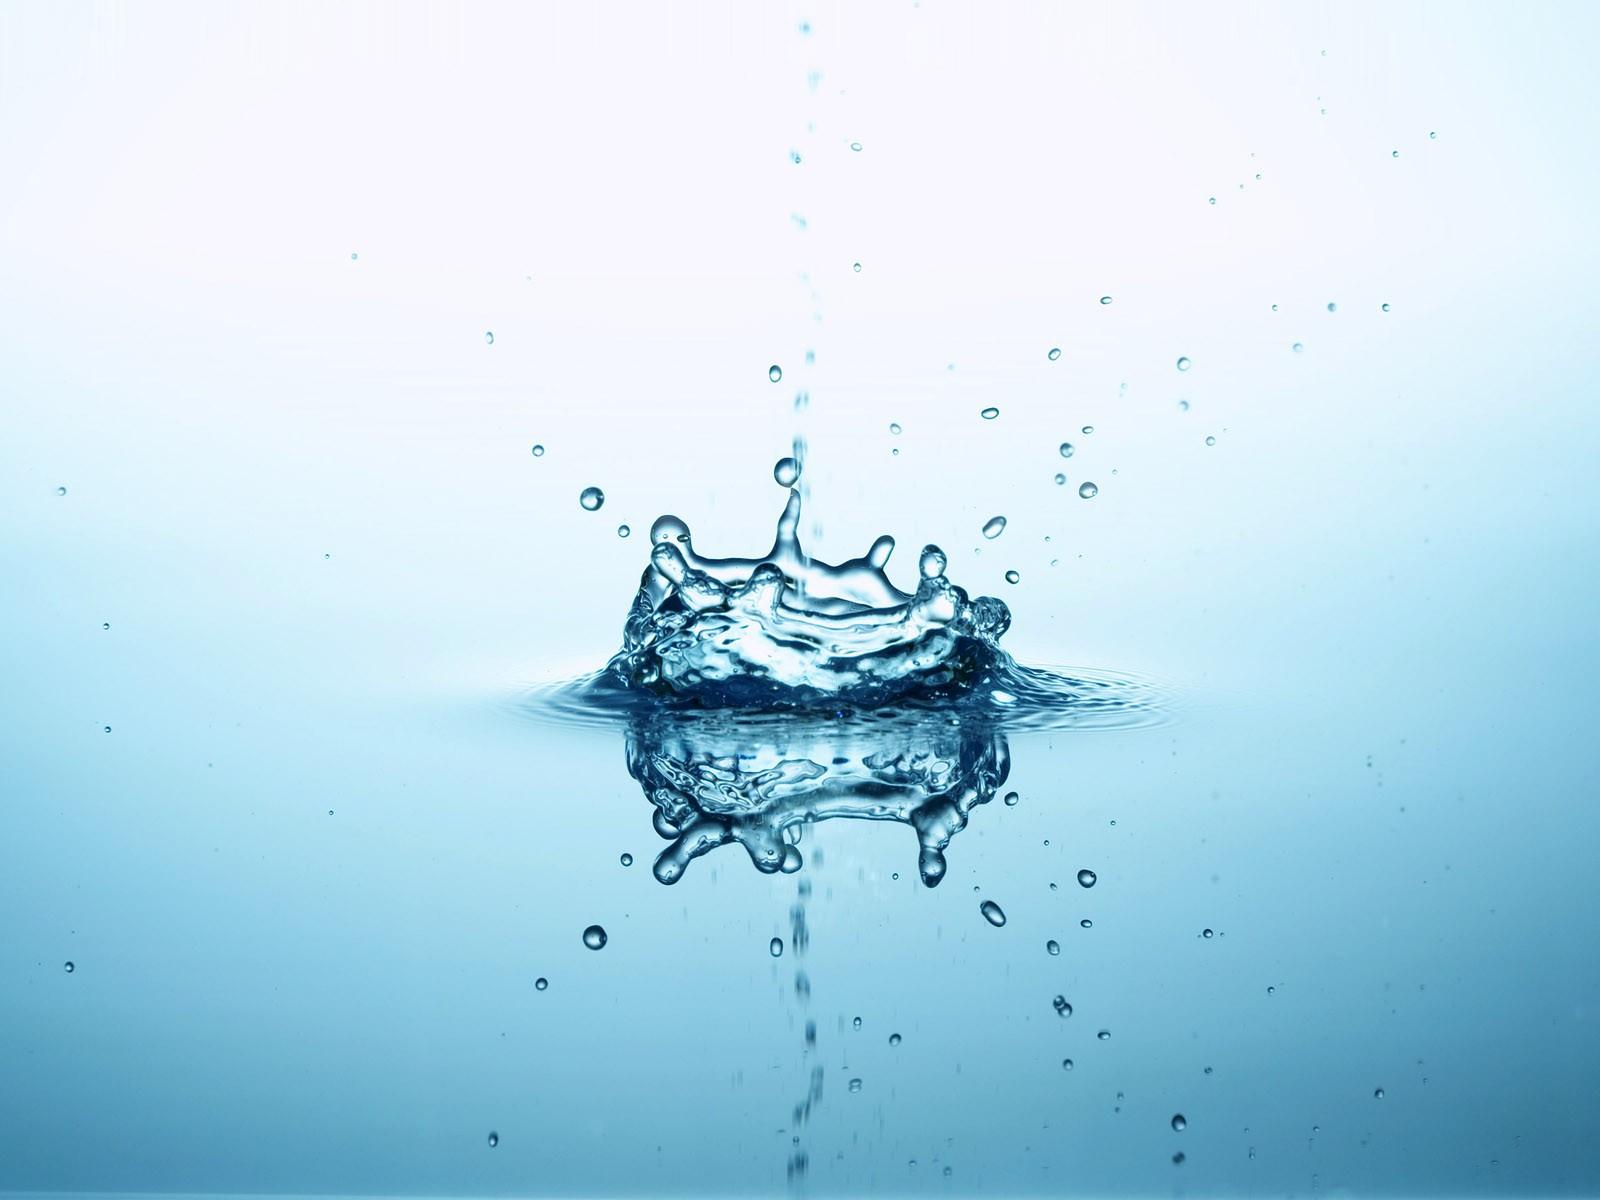 Water Splash Wallpaper 1600x1200 Water Splash 1600x1200